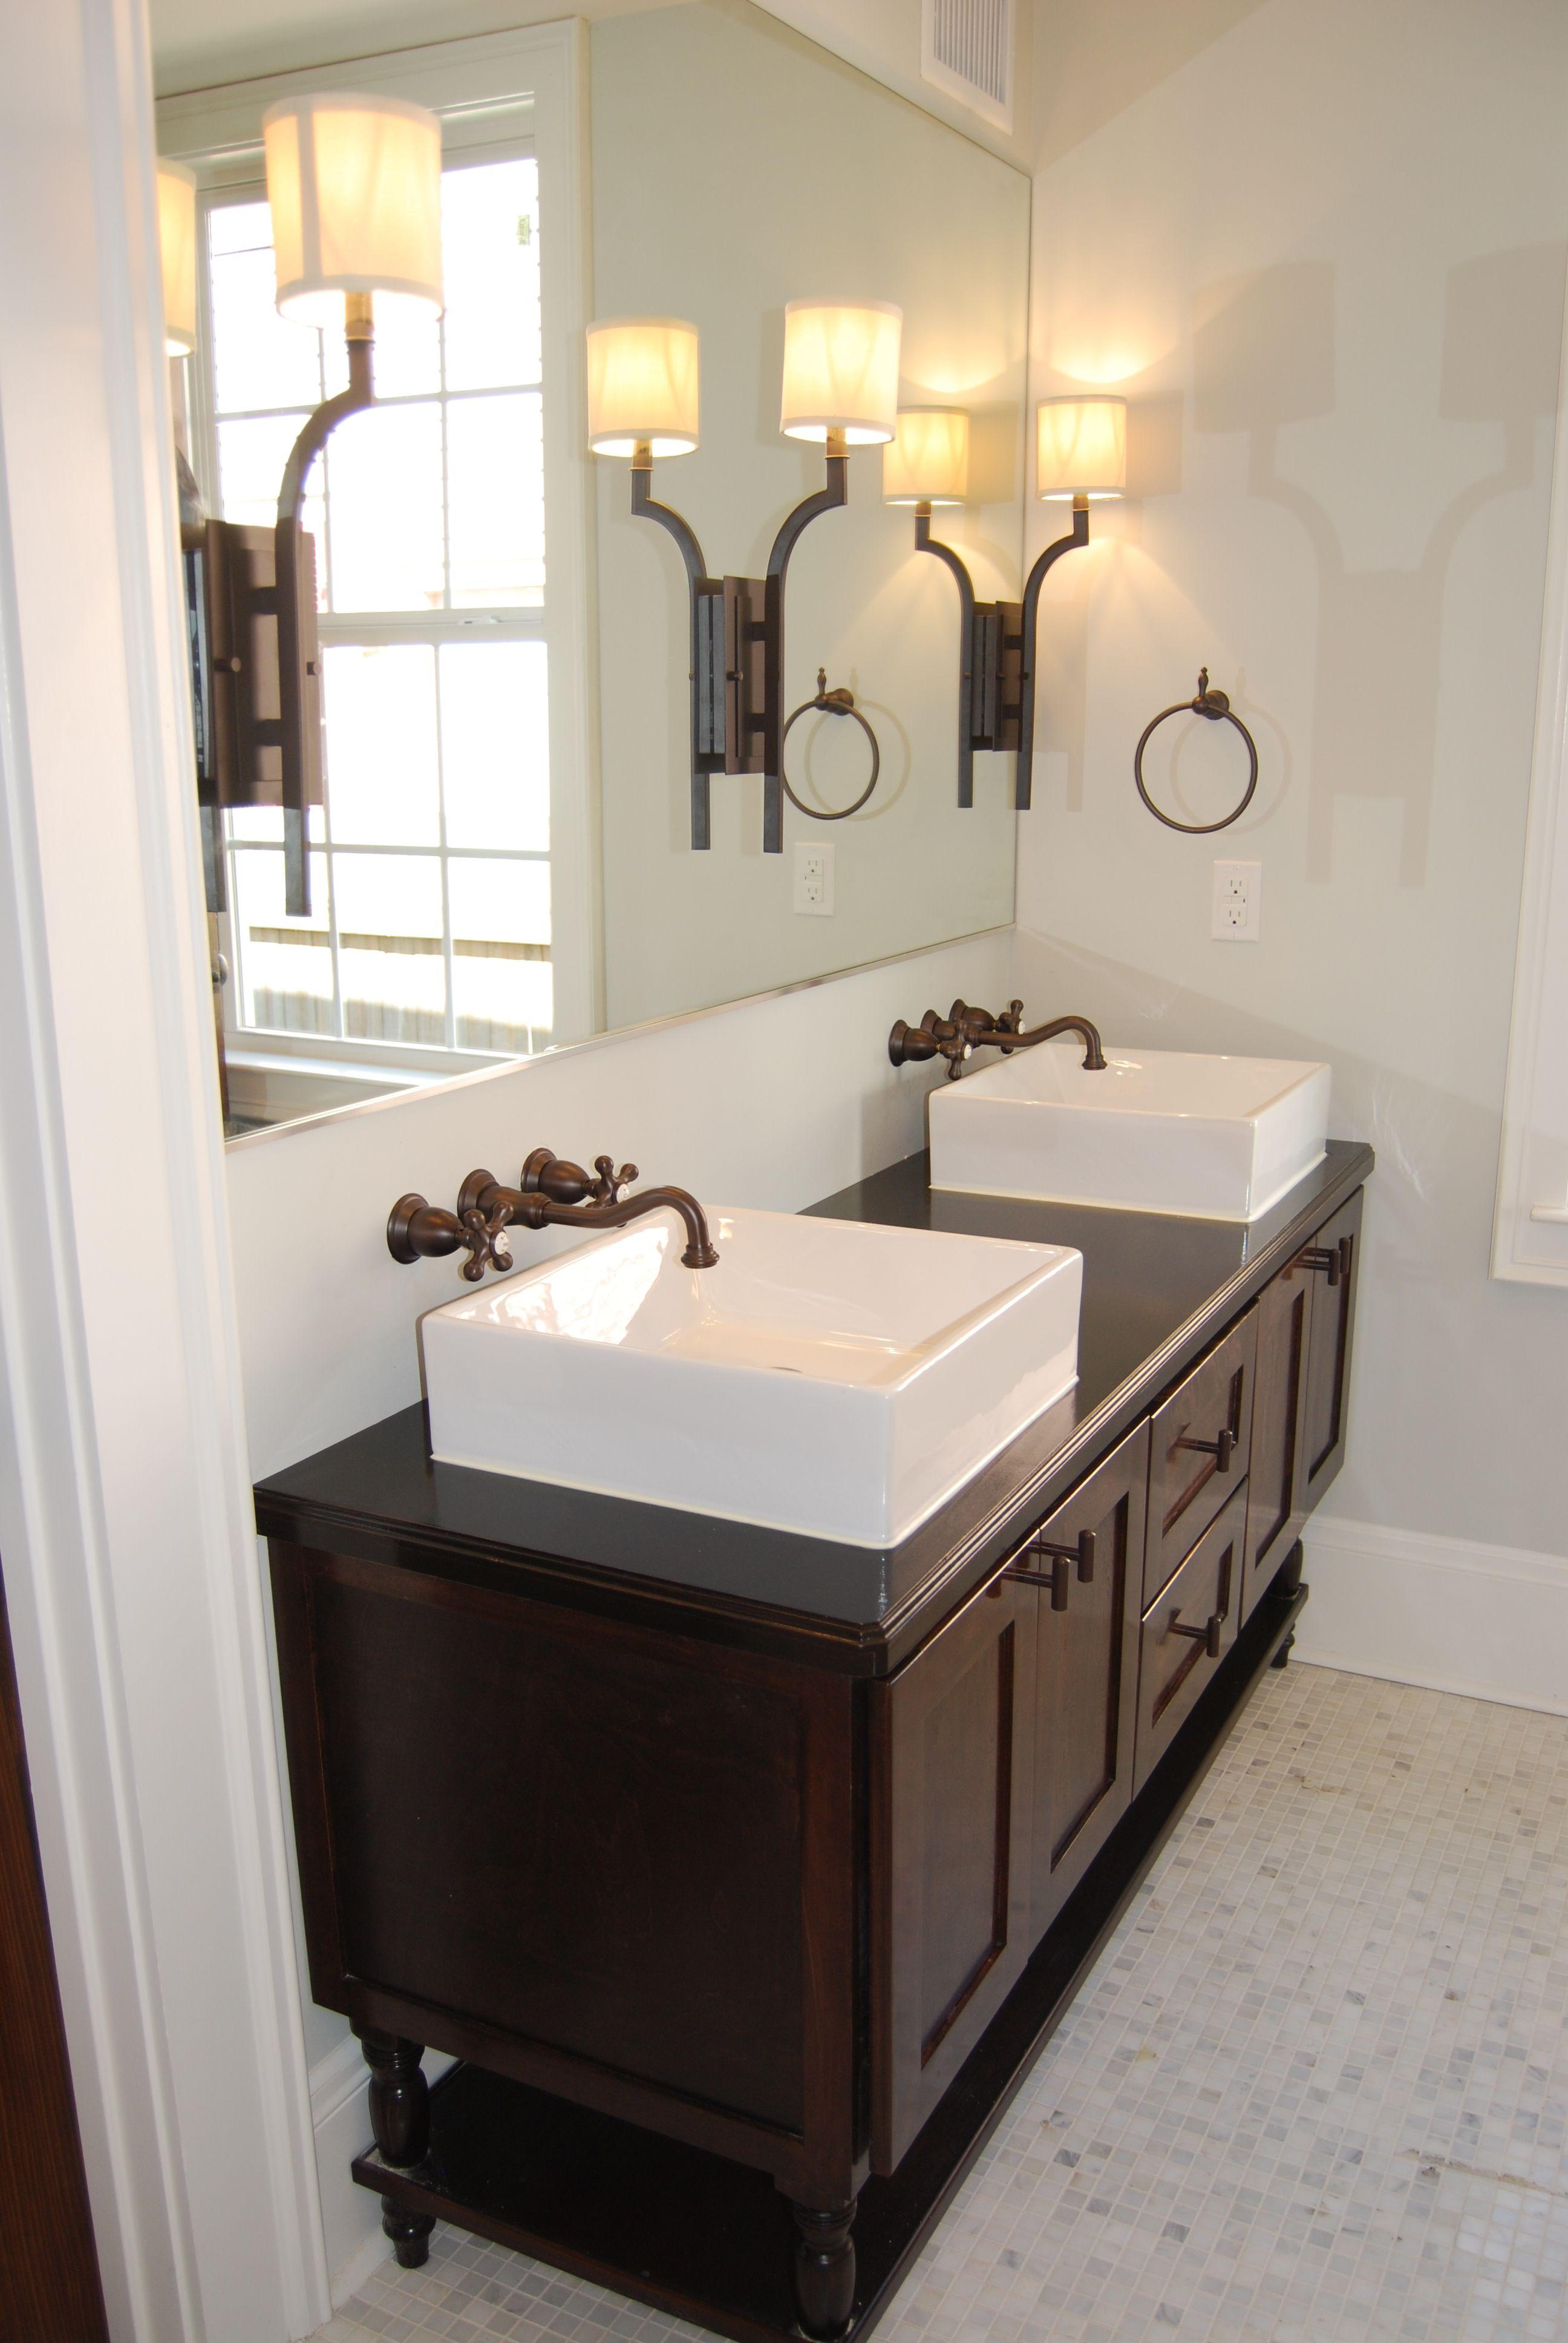 Master Bath Custom Designed And Built Double Vanity Vessel Bowl Sinks Oil Rubbed Bronze Double Sink Bathroom Double Sink Bathroom Vanity Double Sink Vanity